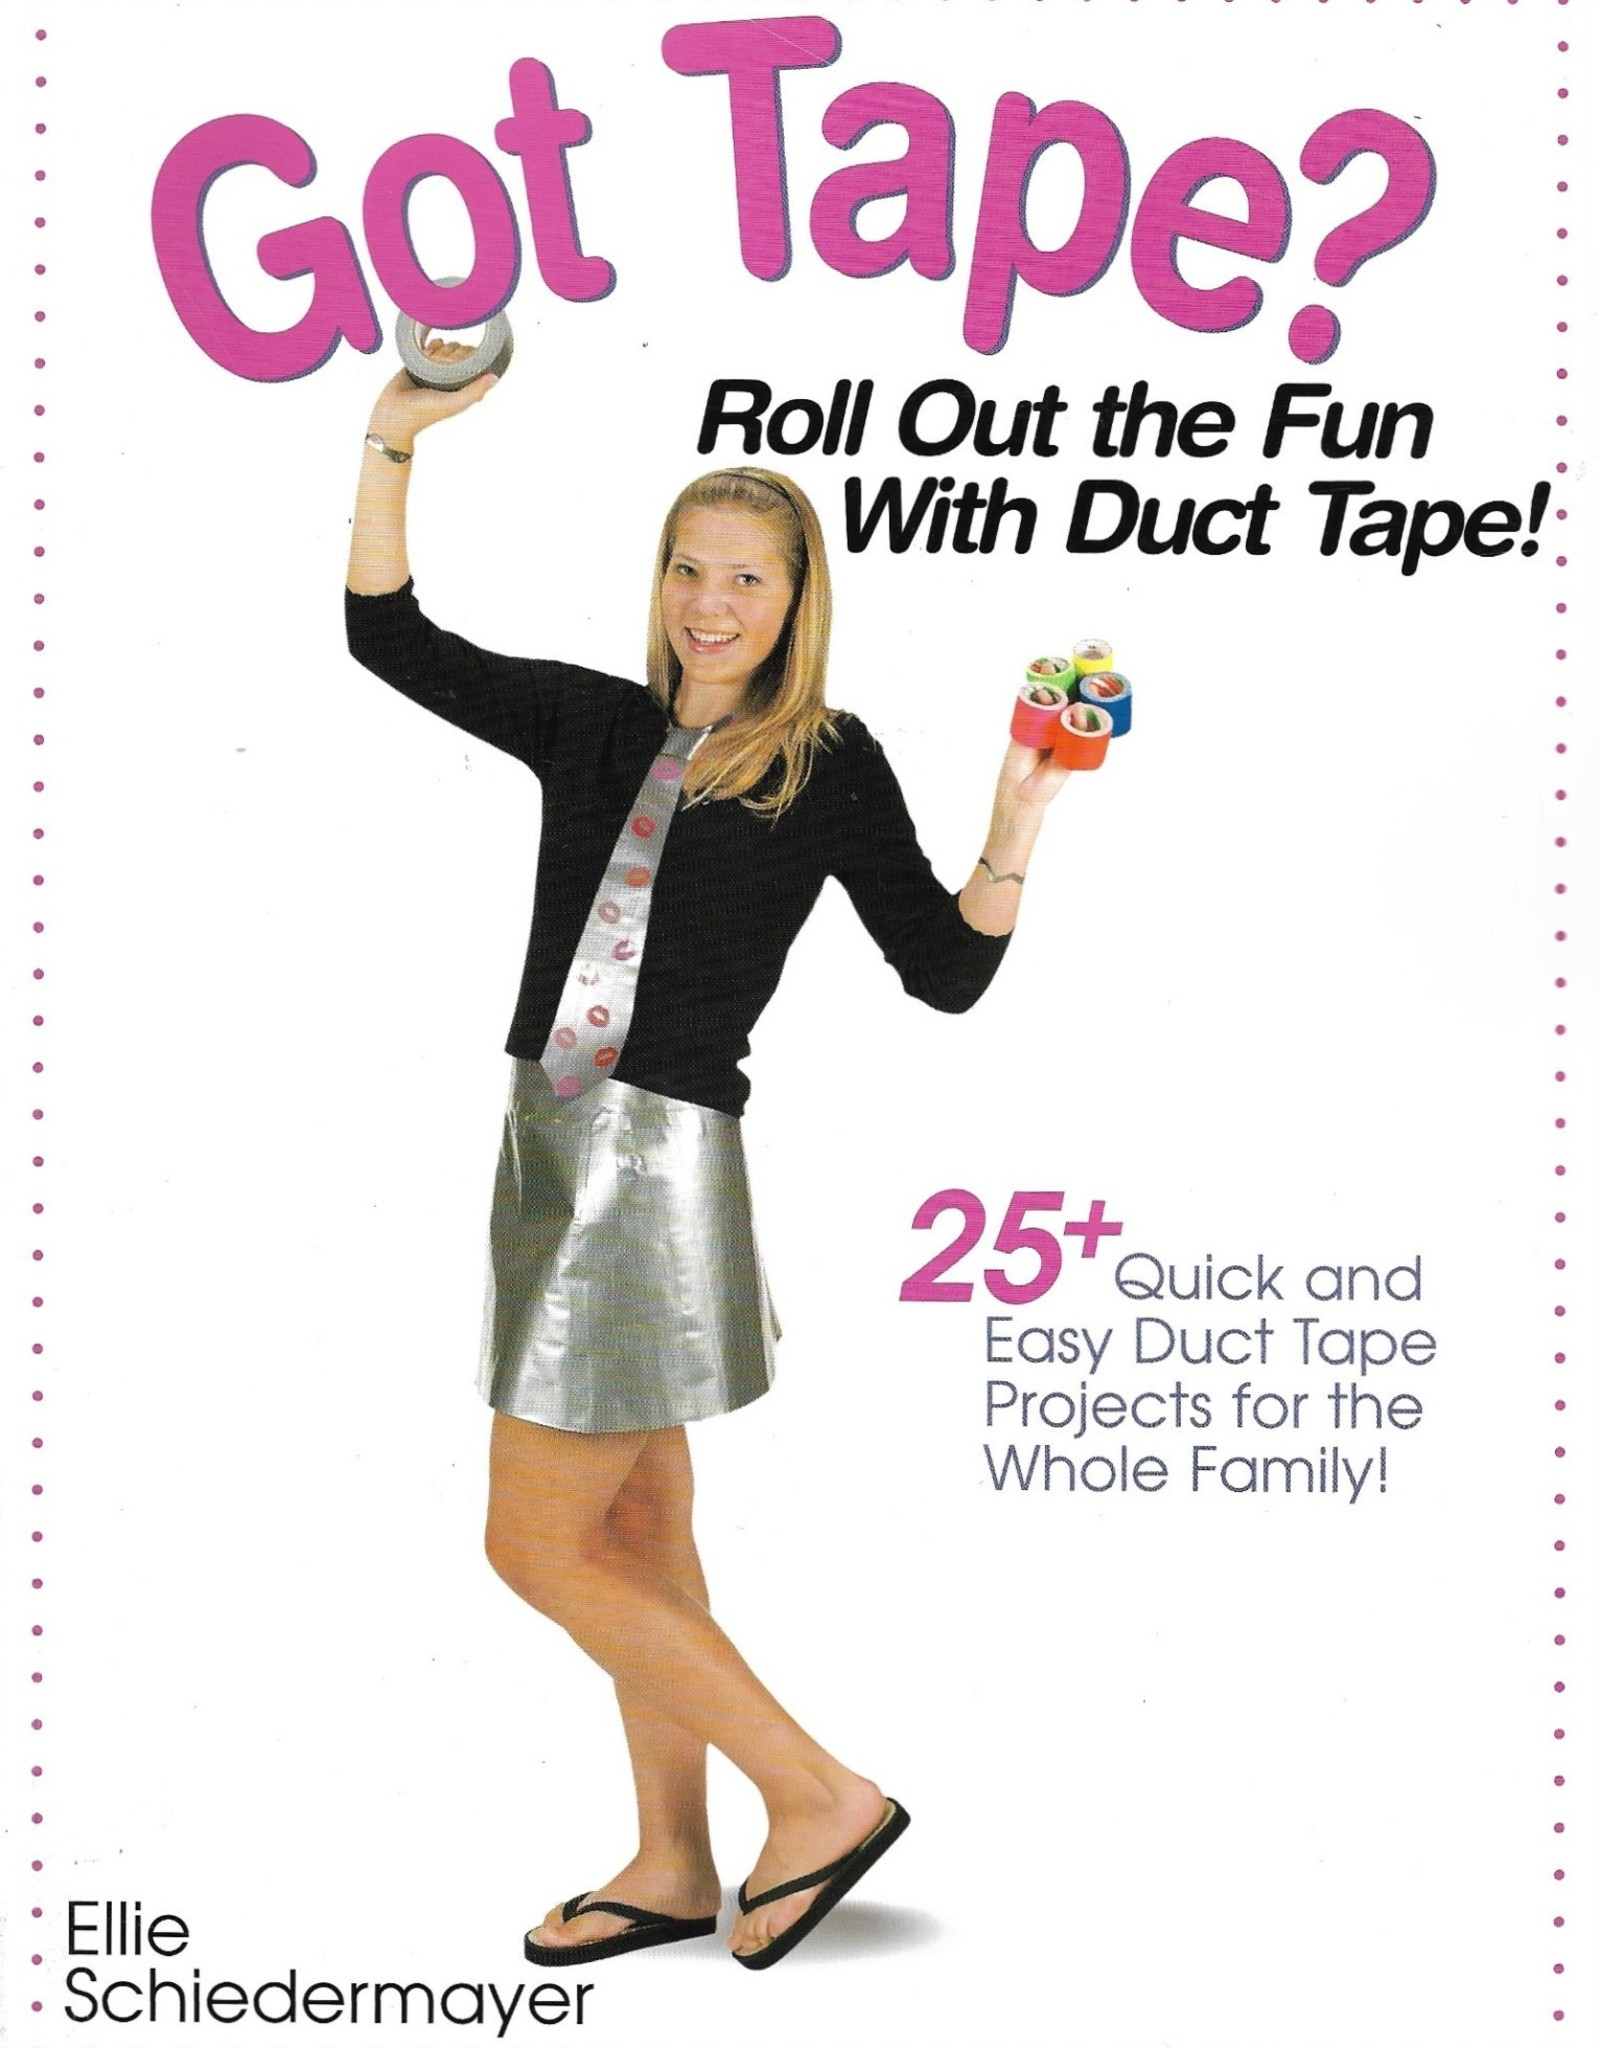 Got Tape? Duct Tape